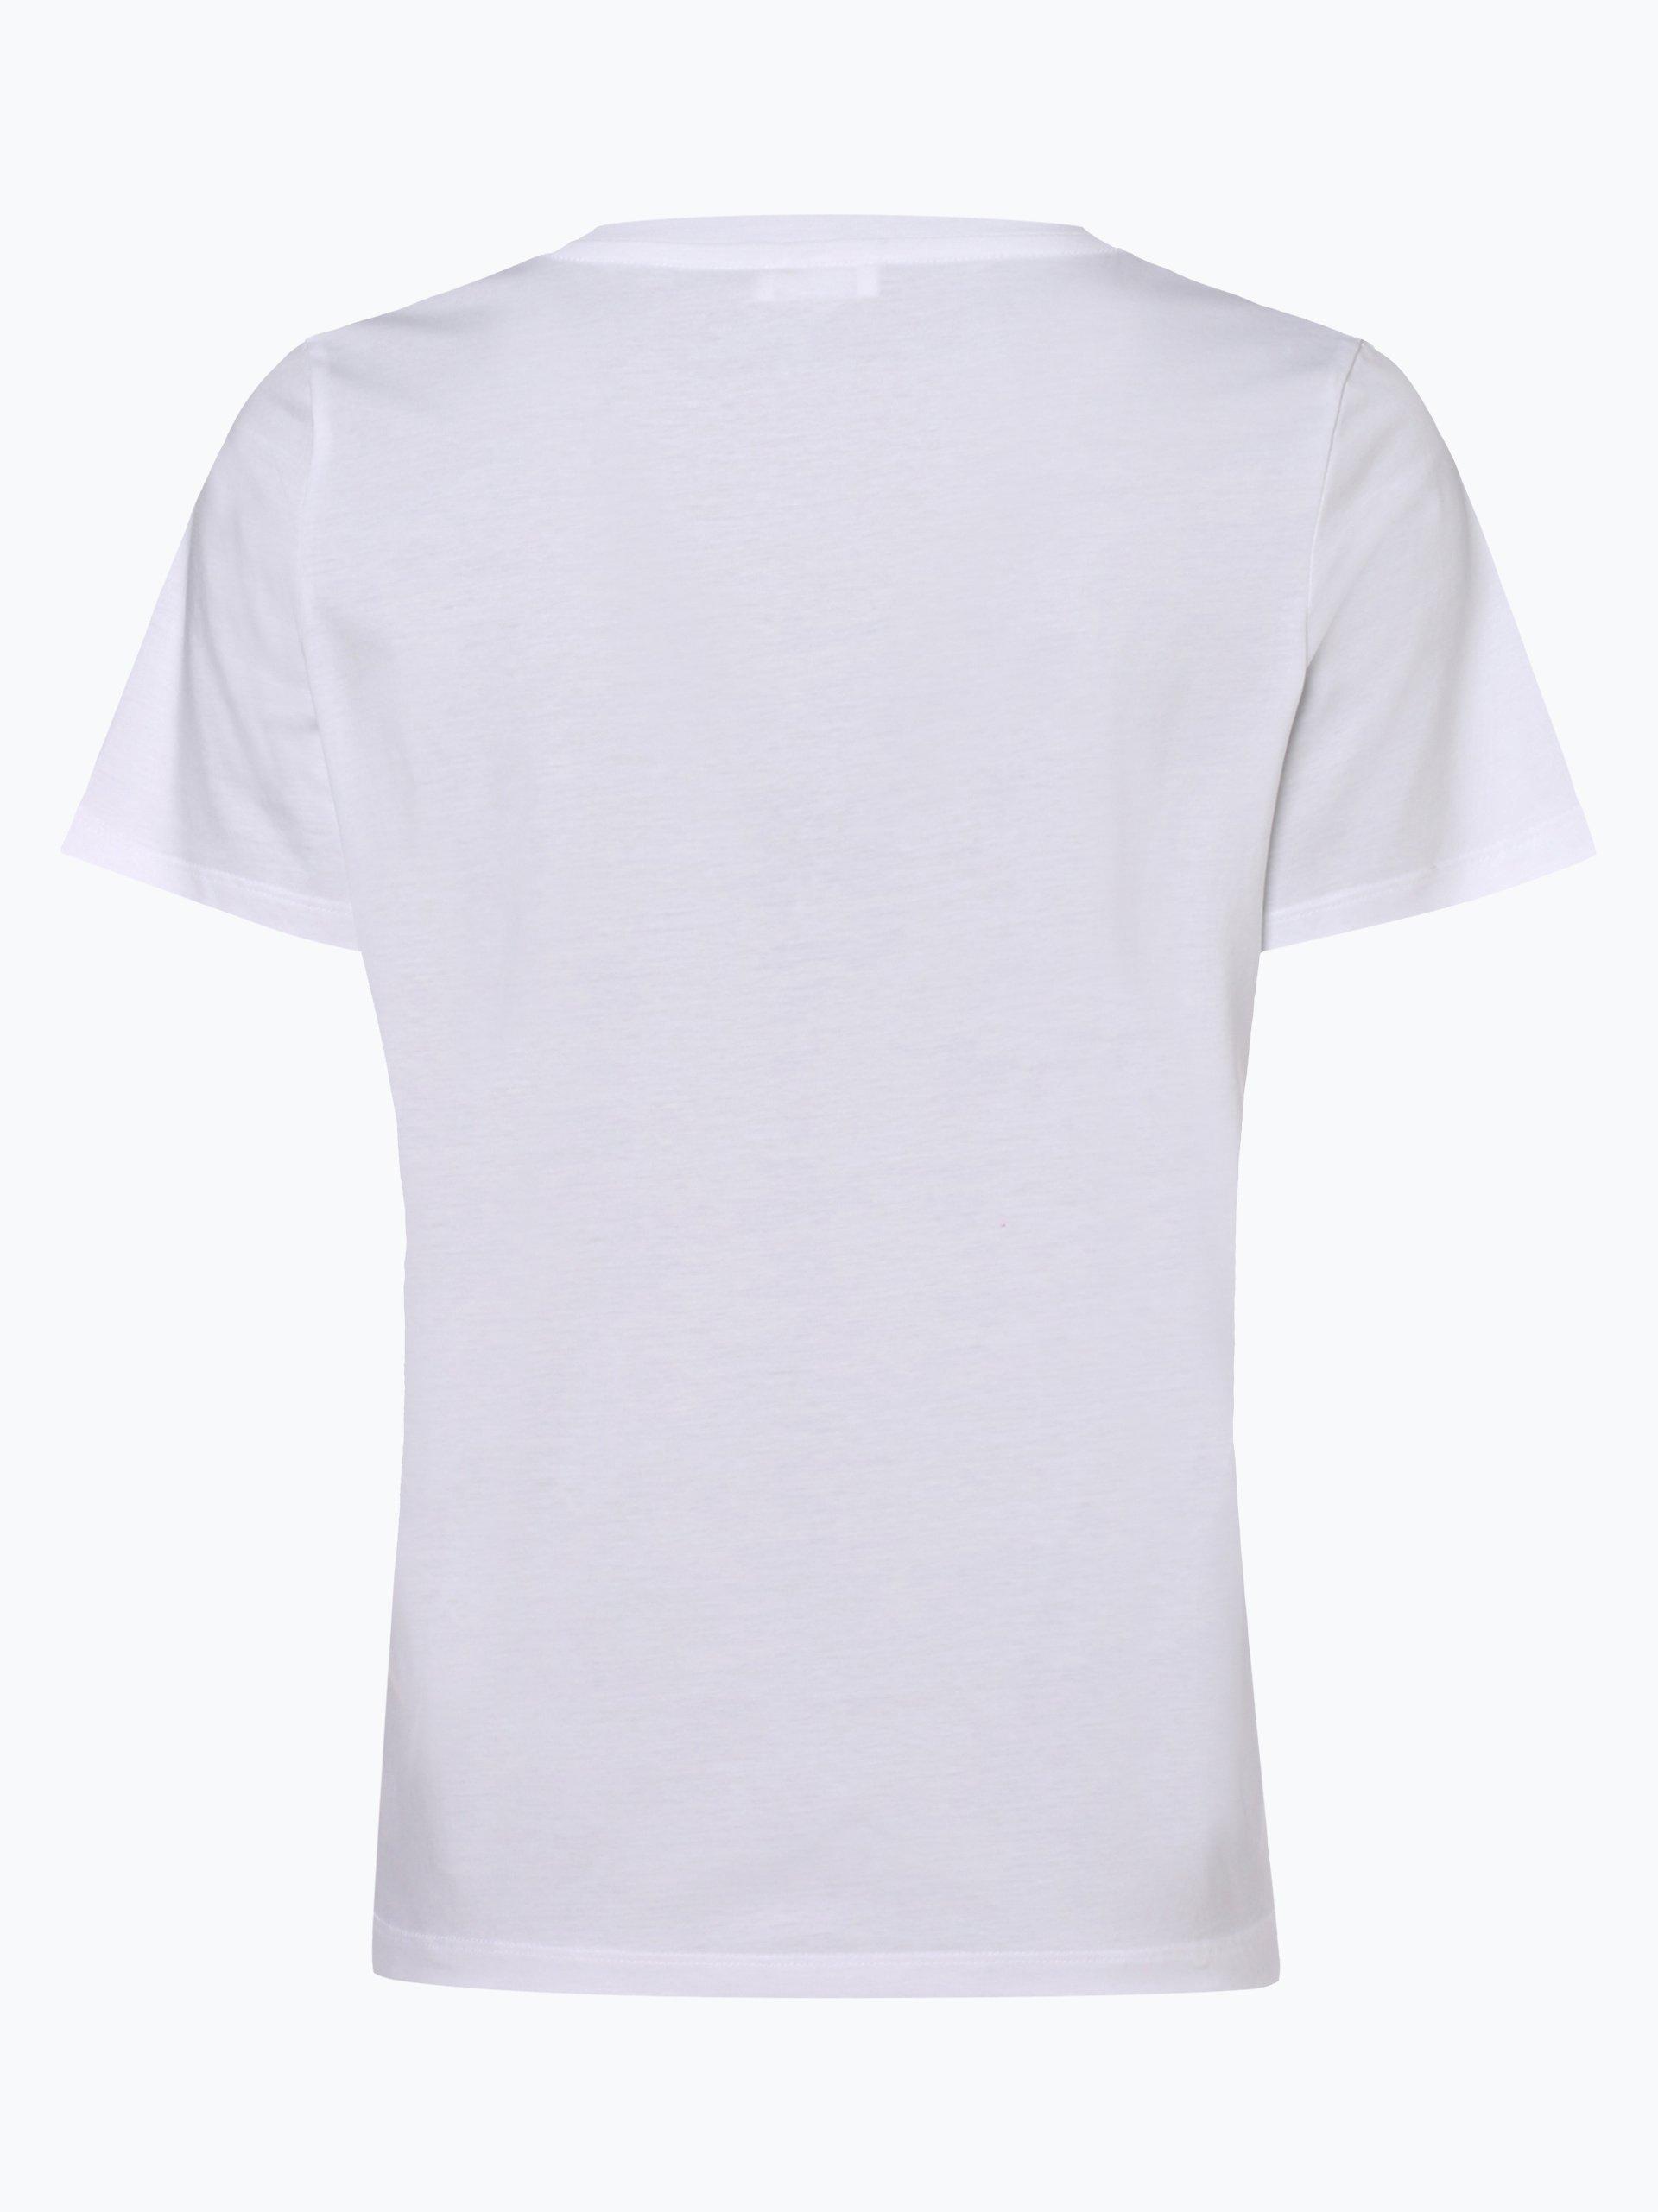 Drykorn Damen T-Shirt - Anisia_P16